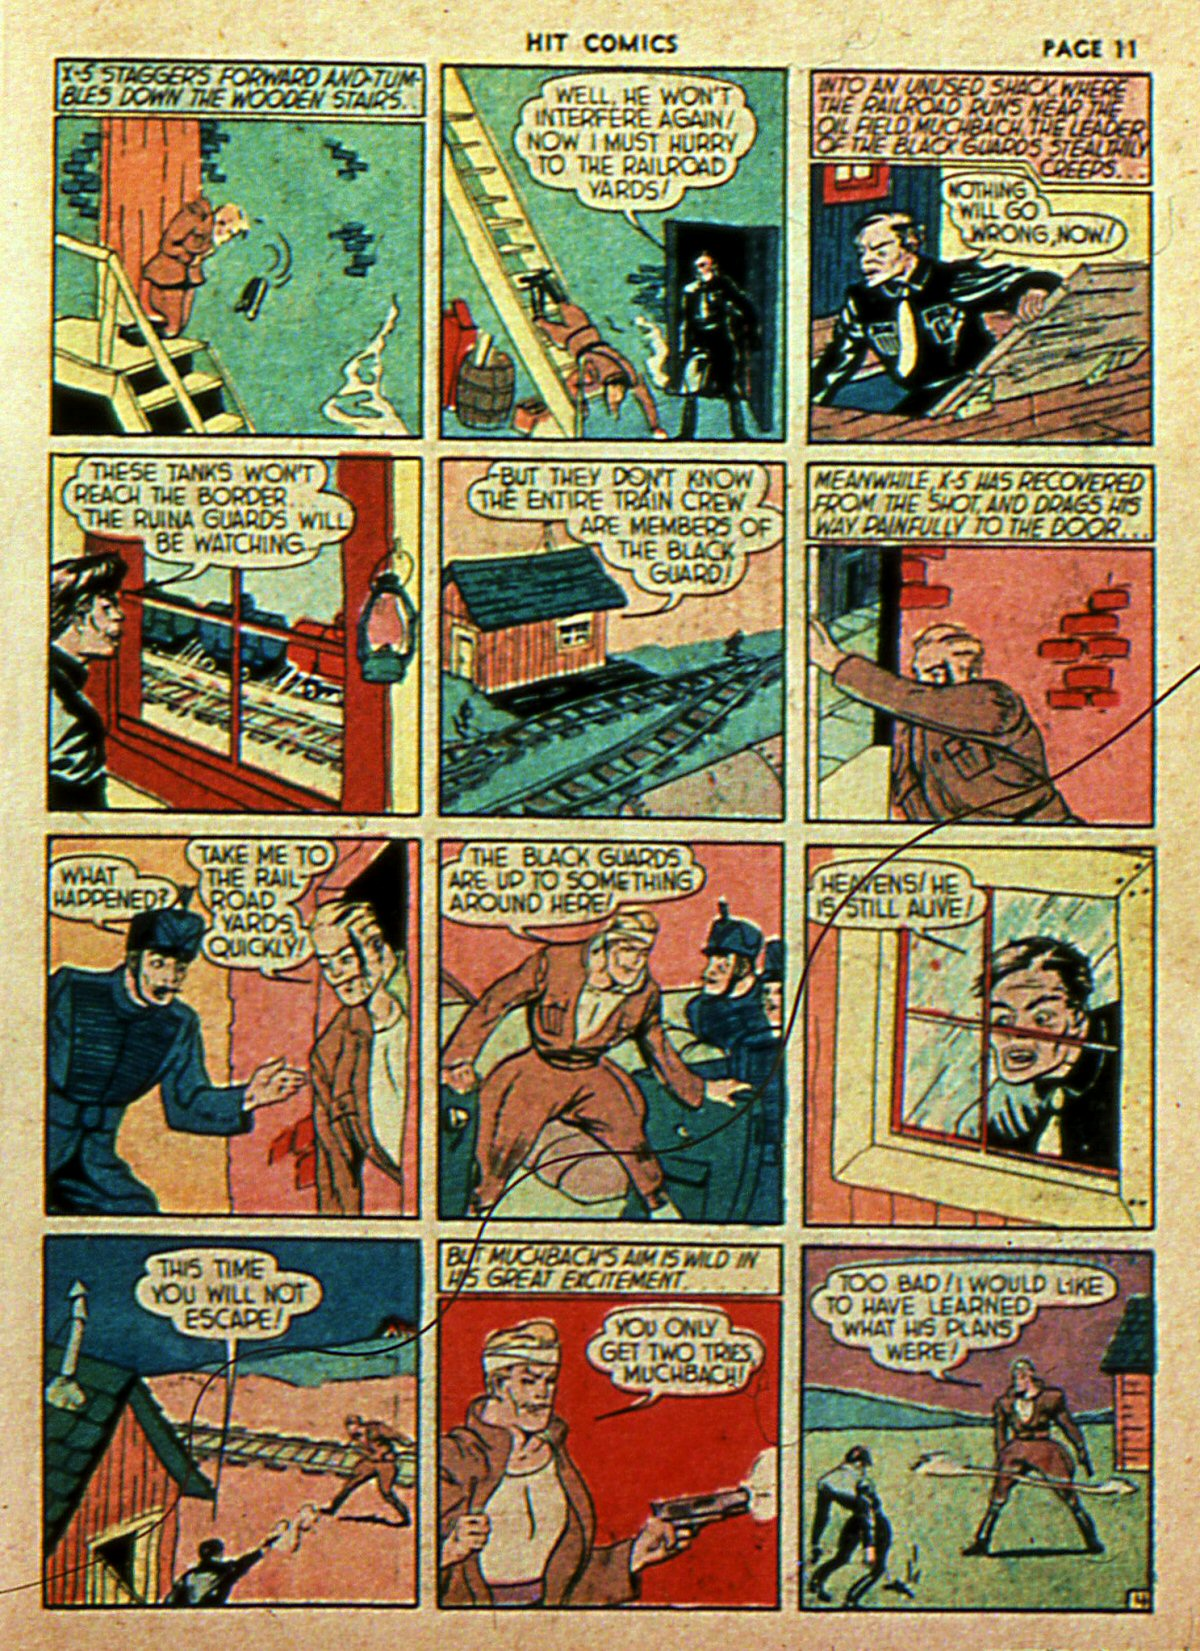 Read online Hit Comics comic -  Issue #2 - 13